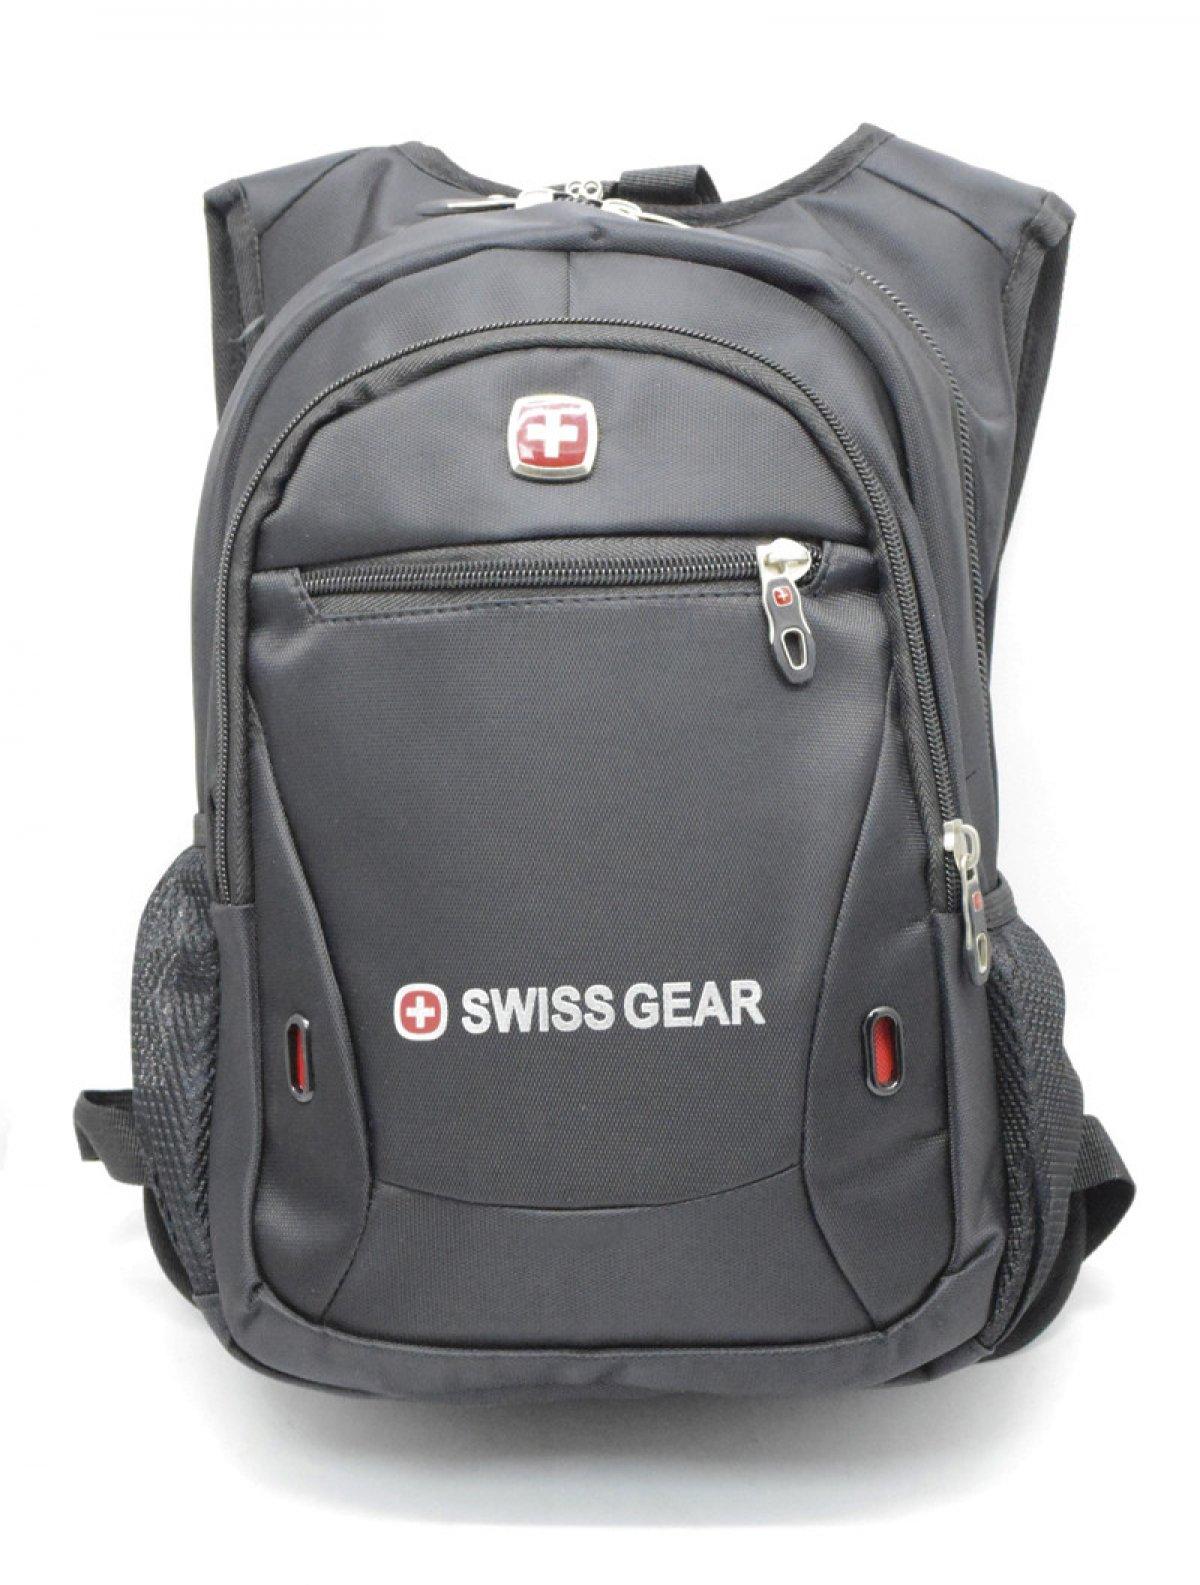 Swiiissgearr 0522-1 рюкзак черный текстиль